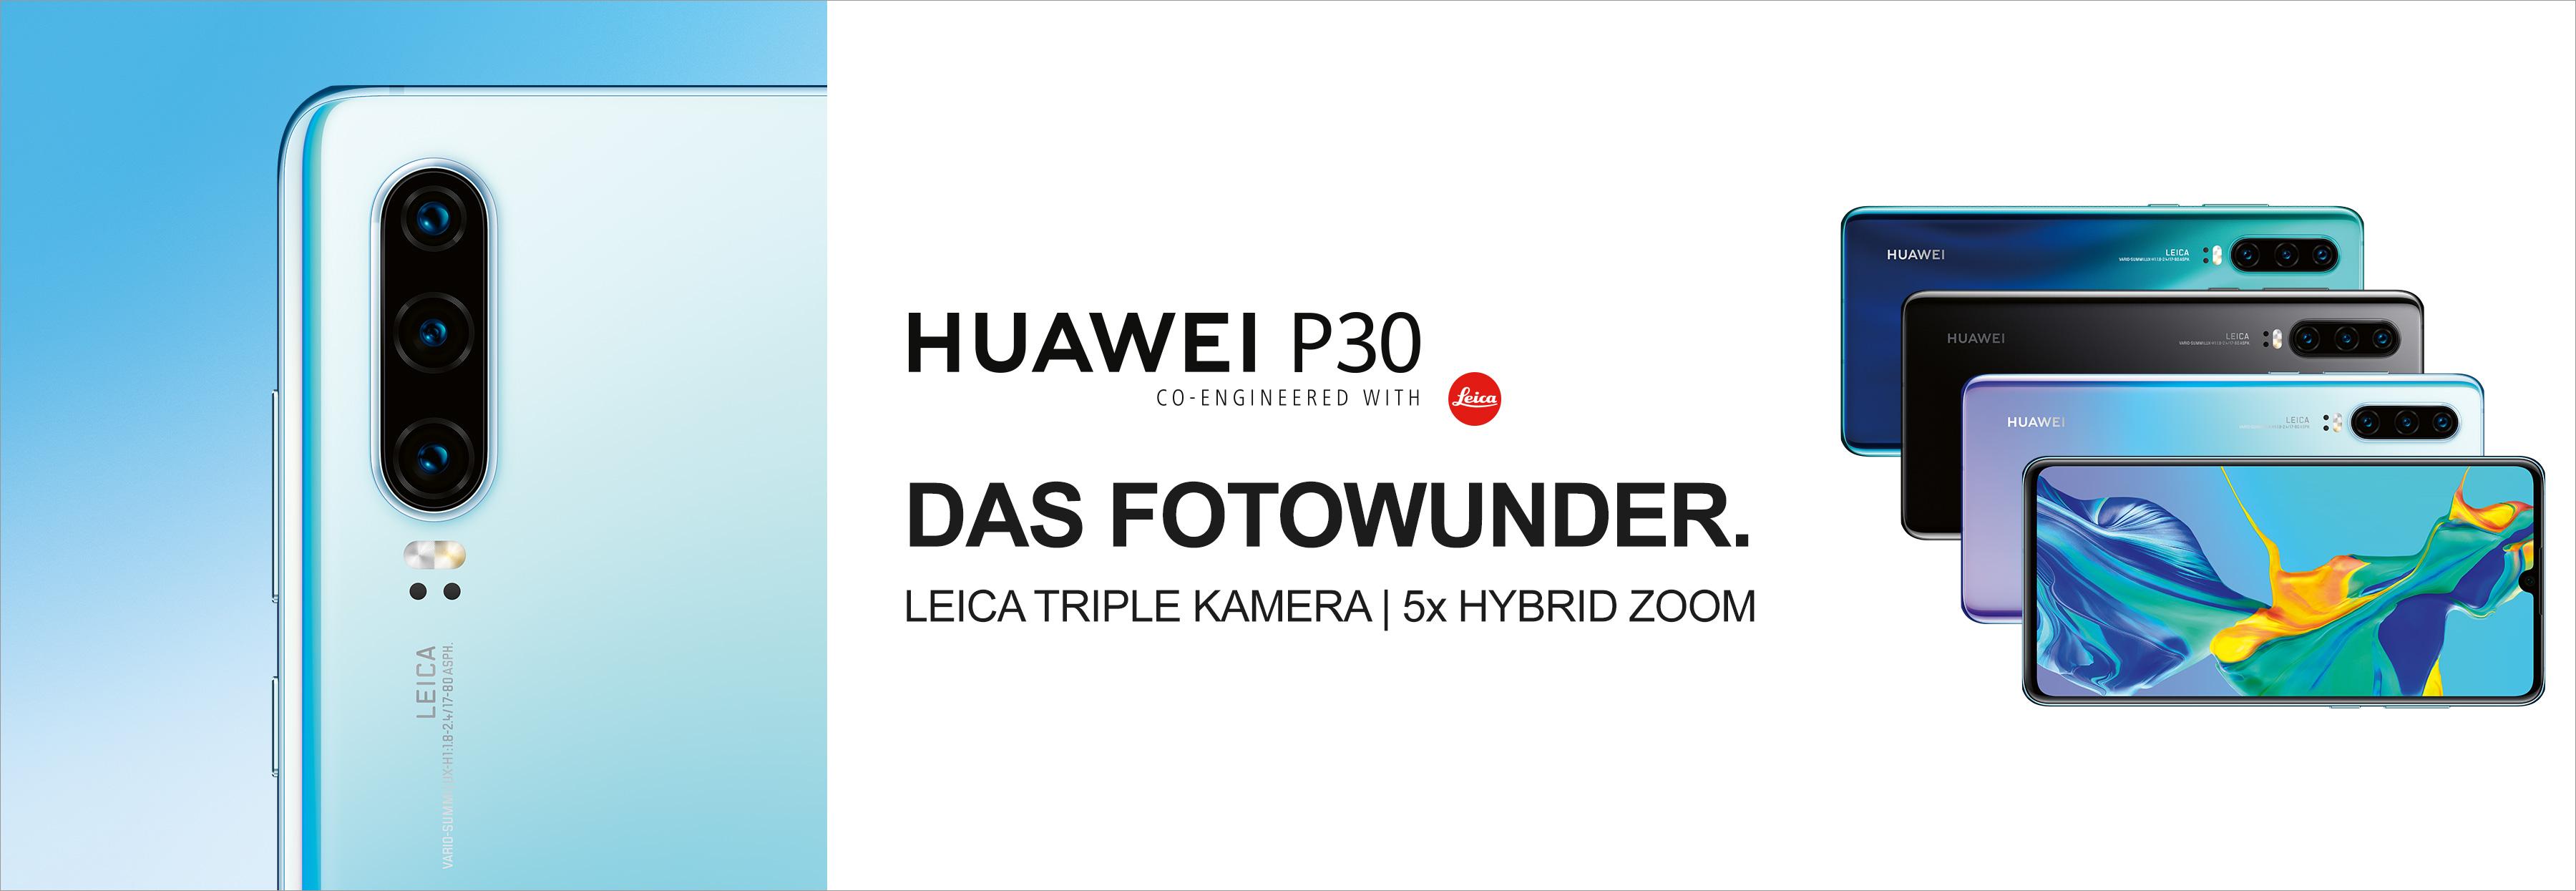 Neues Huawei P30